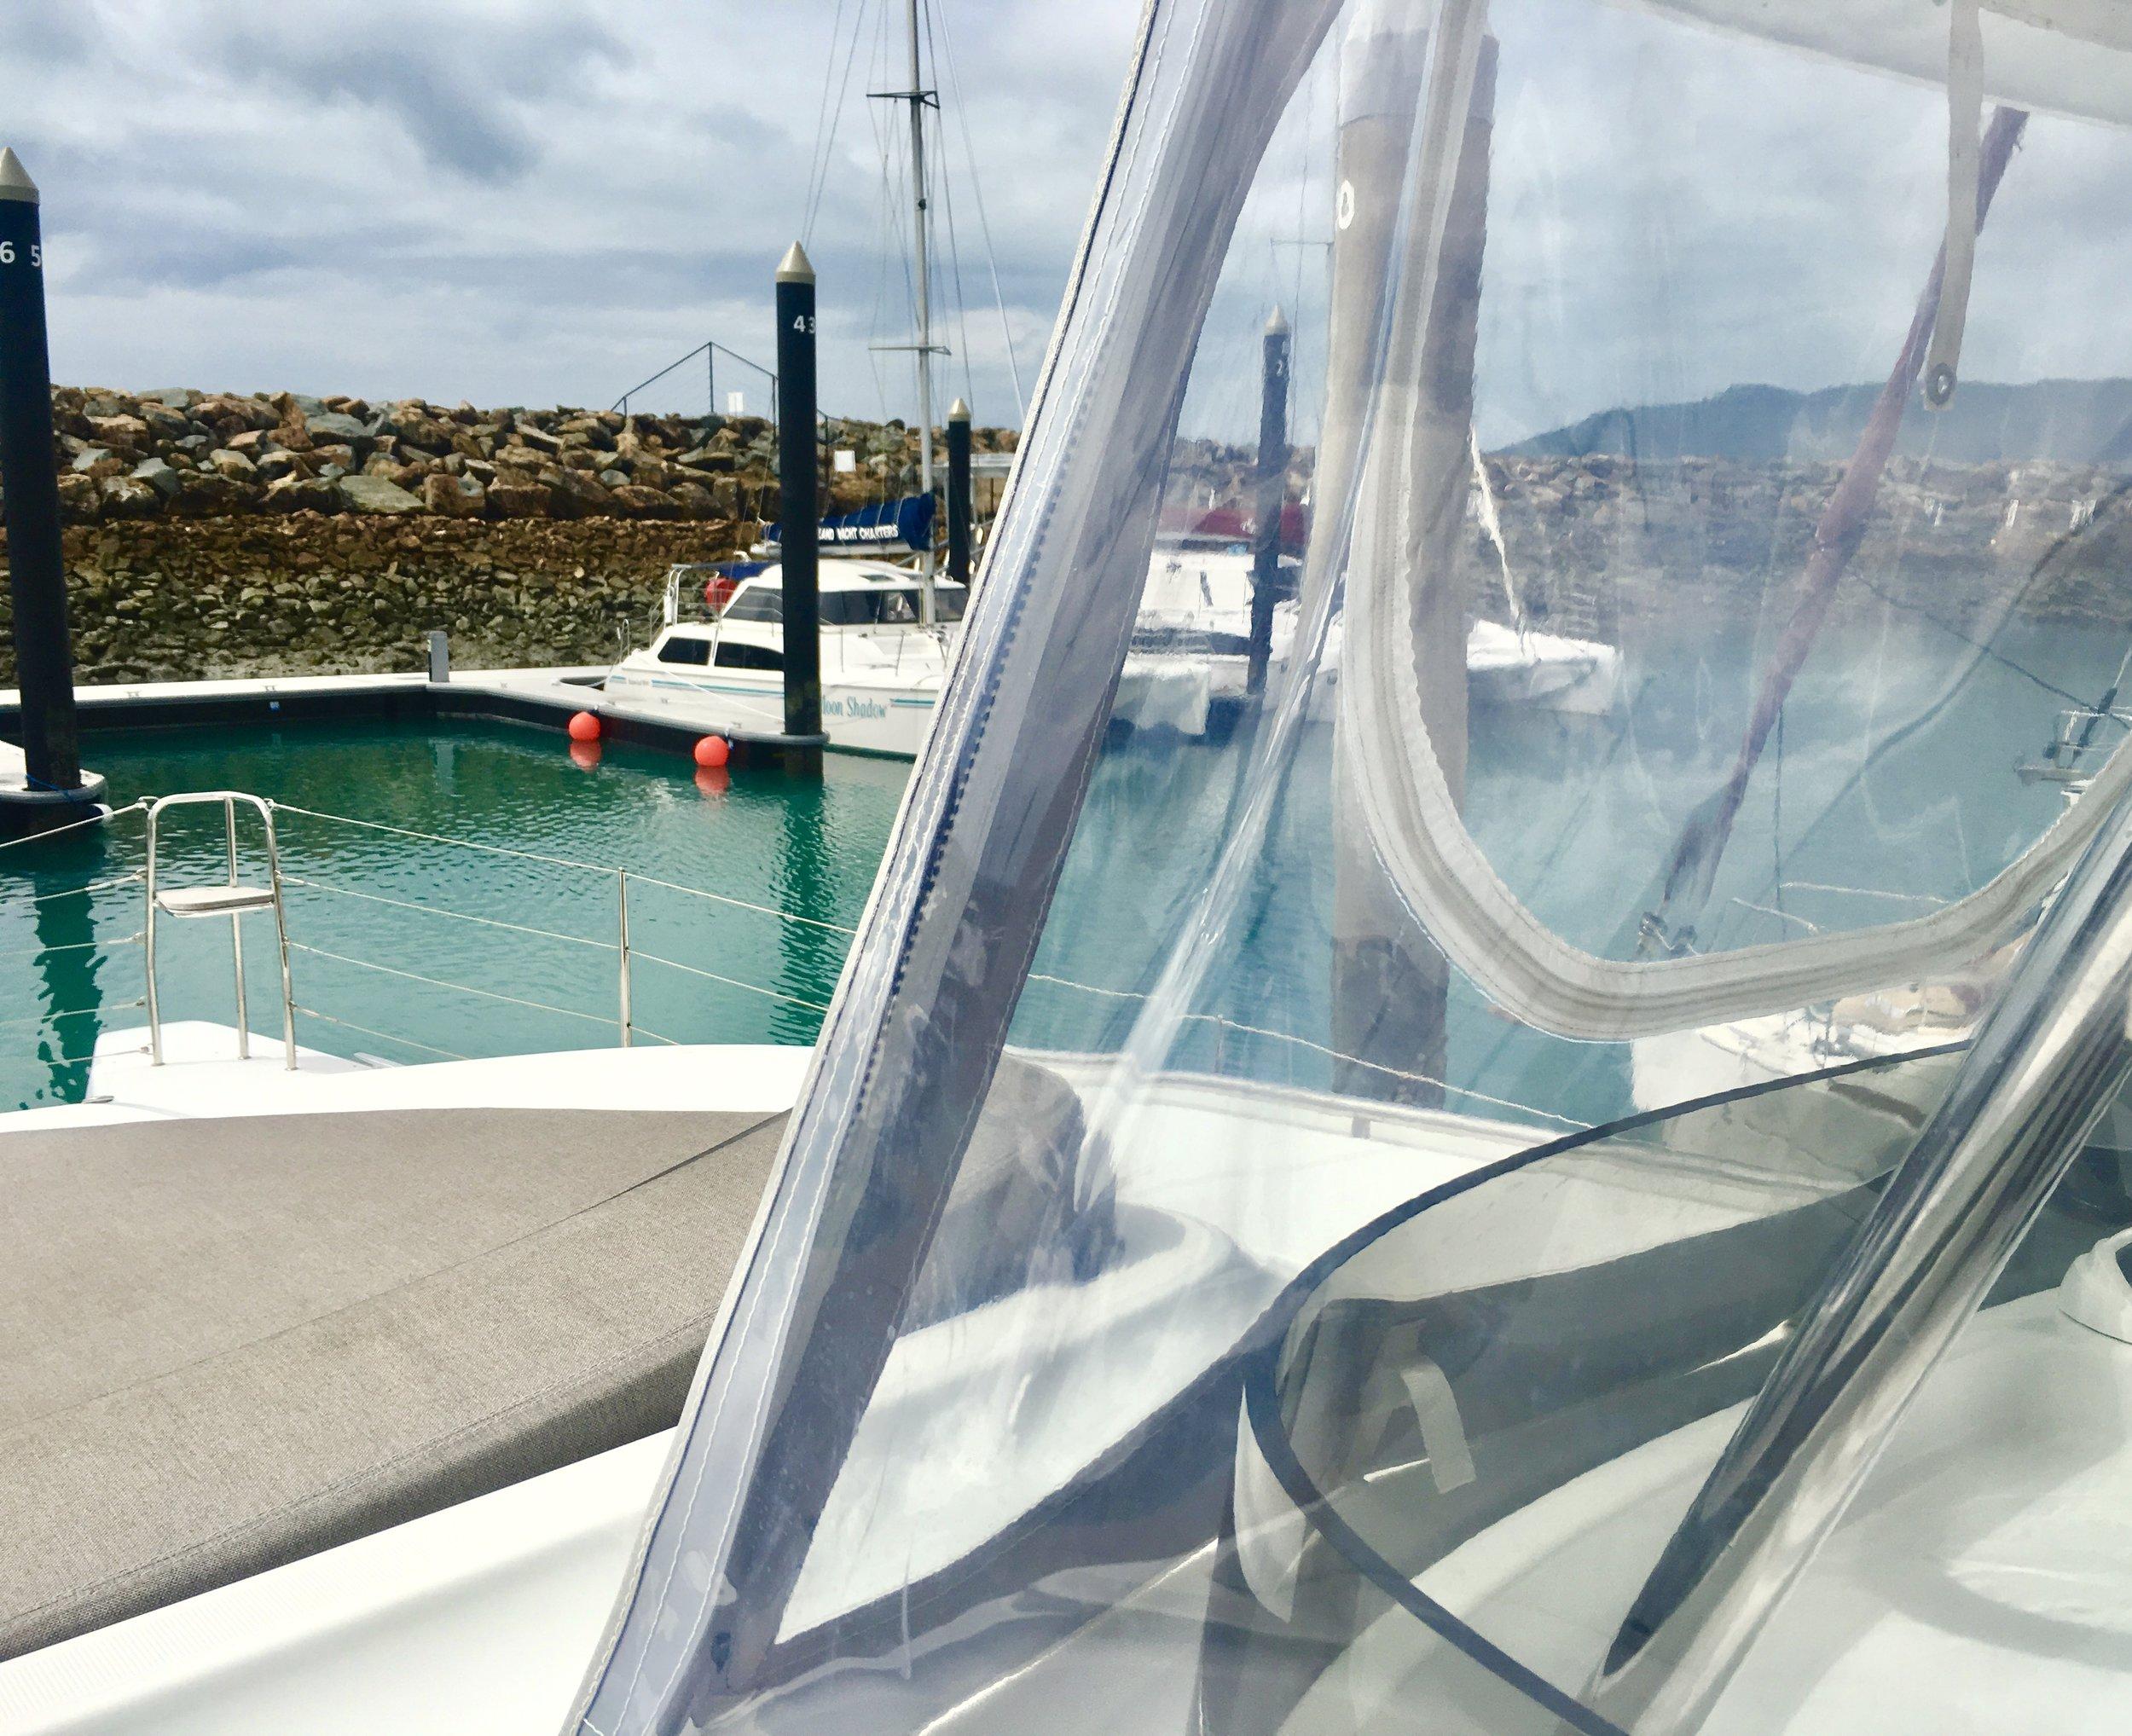 Superyacht Engine Room and Lazarette